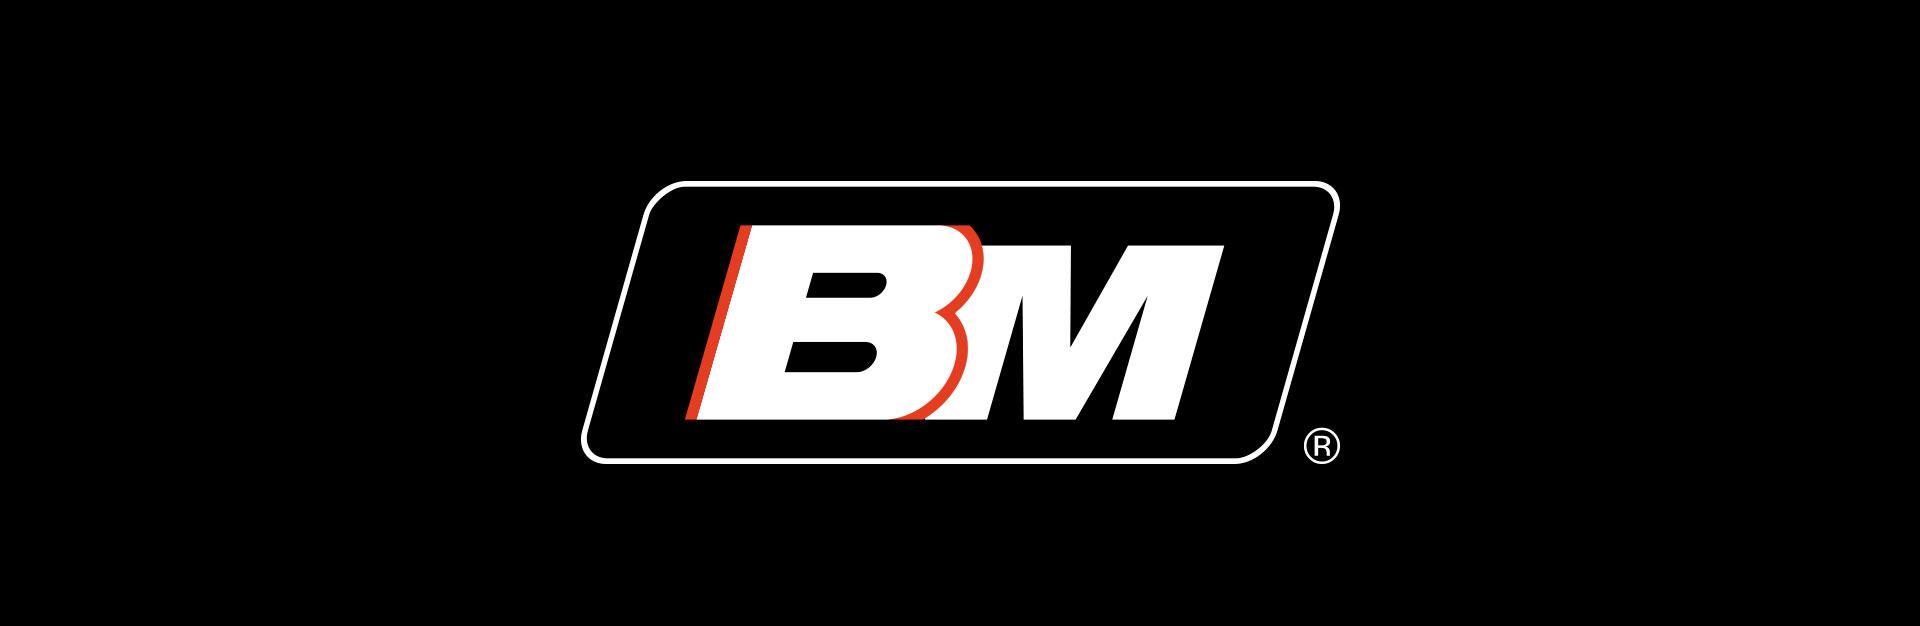 BM_01